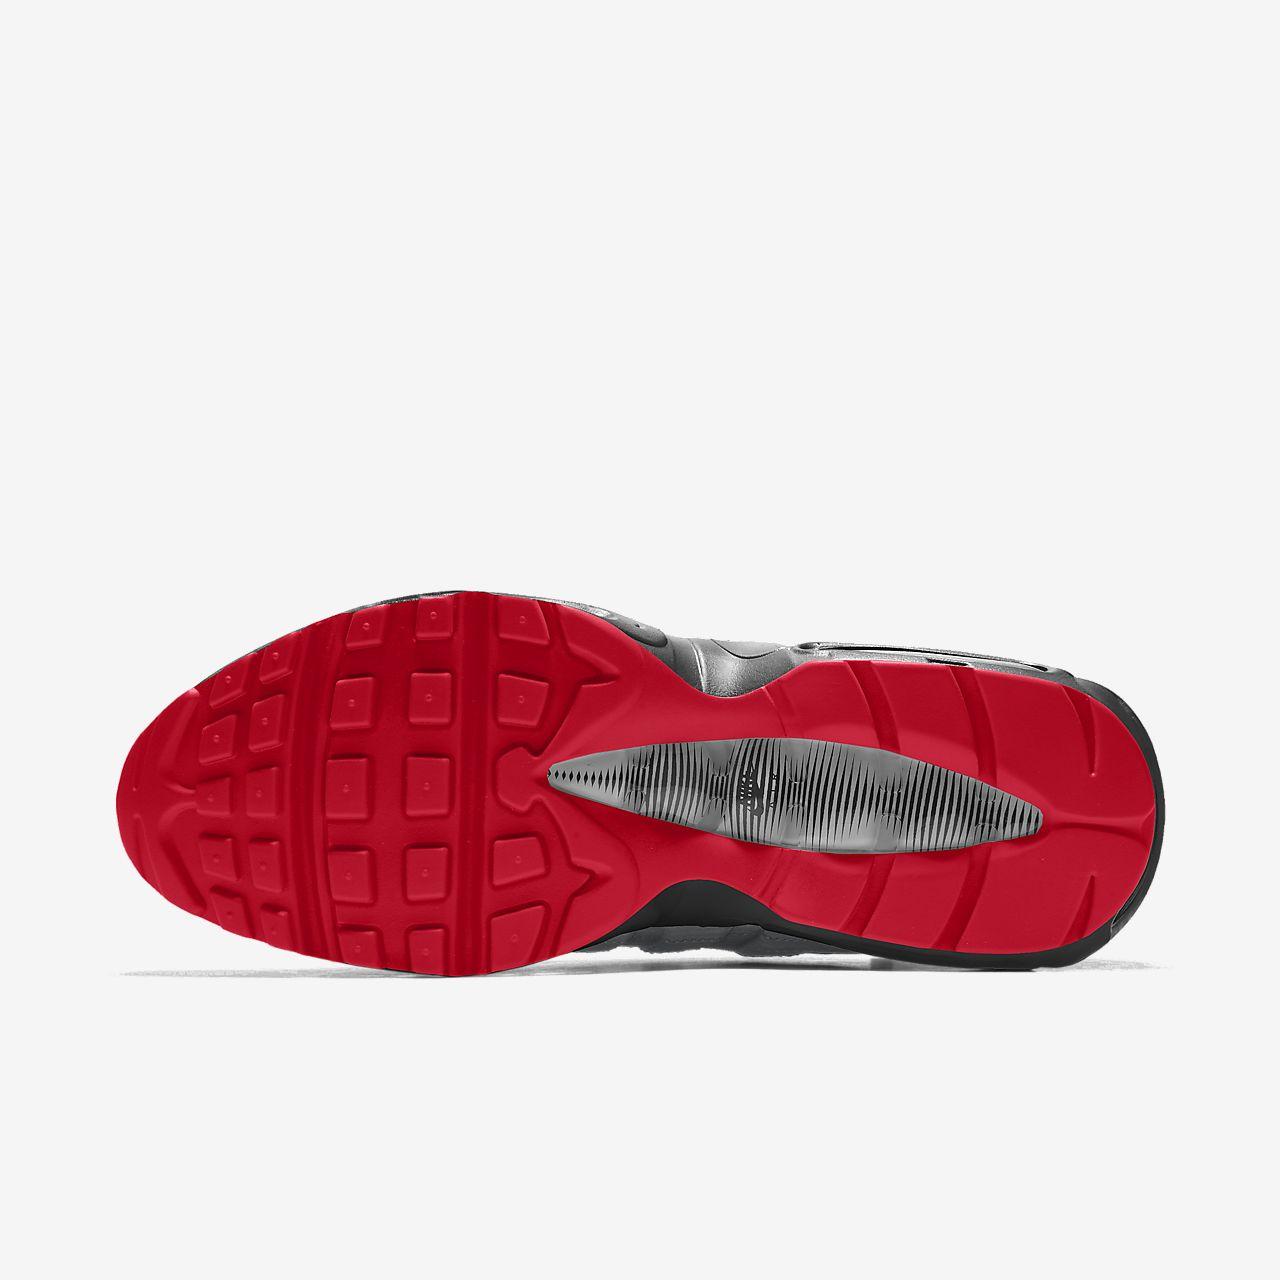 Calzado personalizado Nike Air Max 720 By You. PR